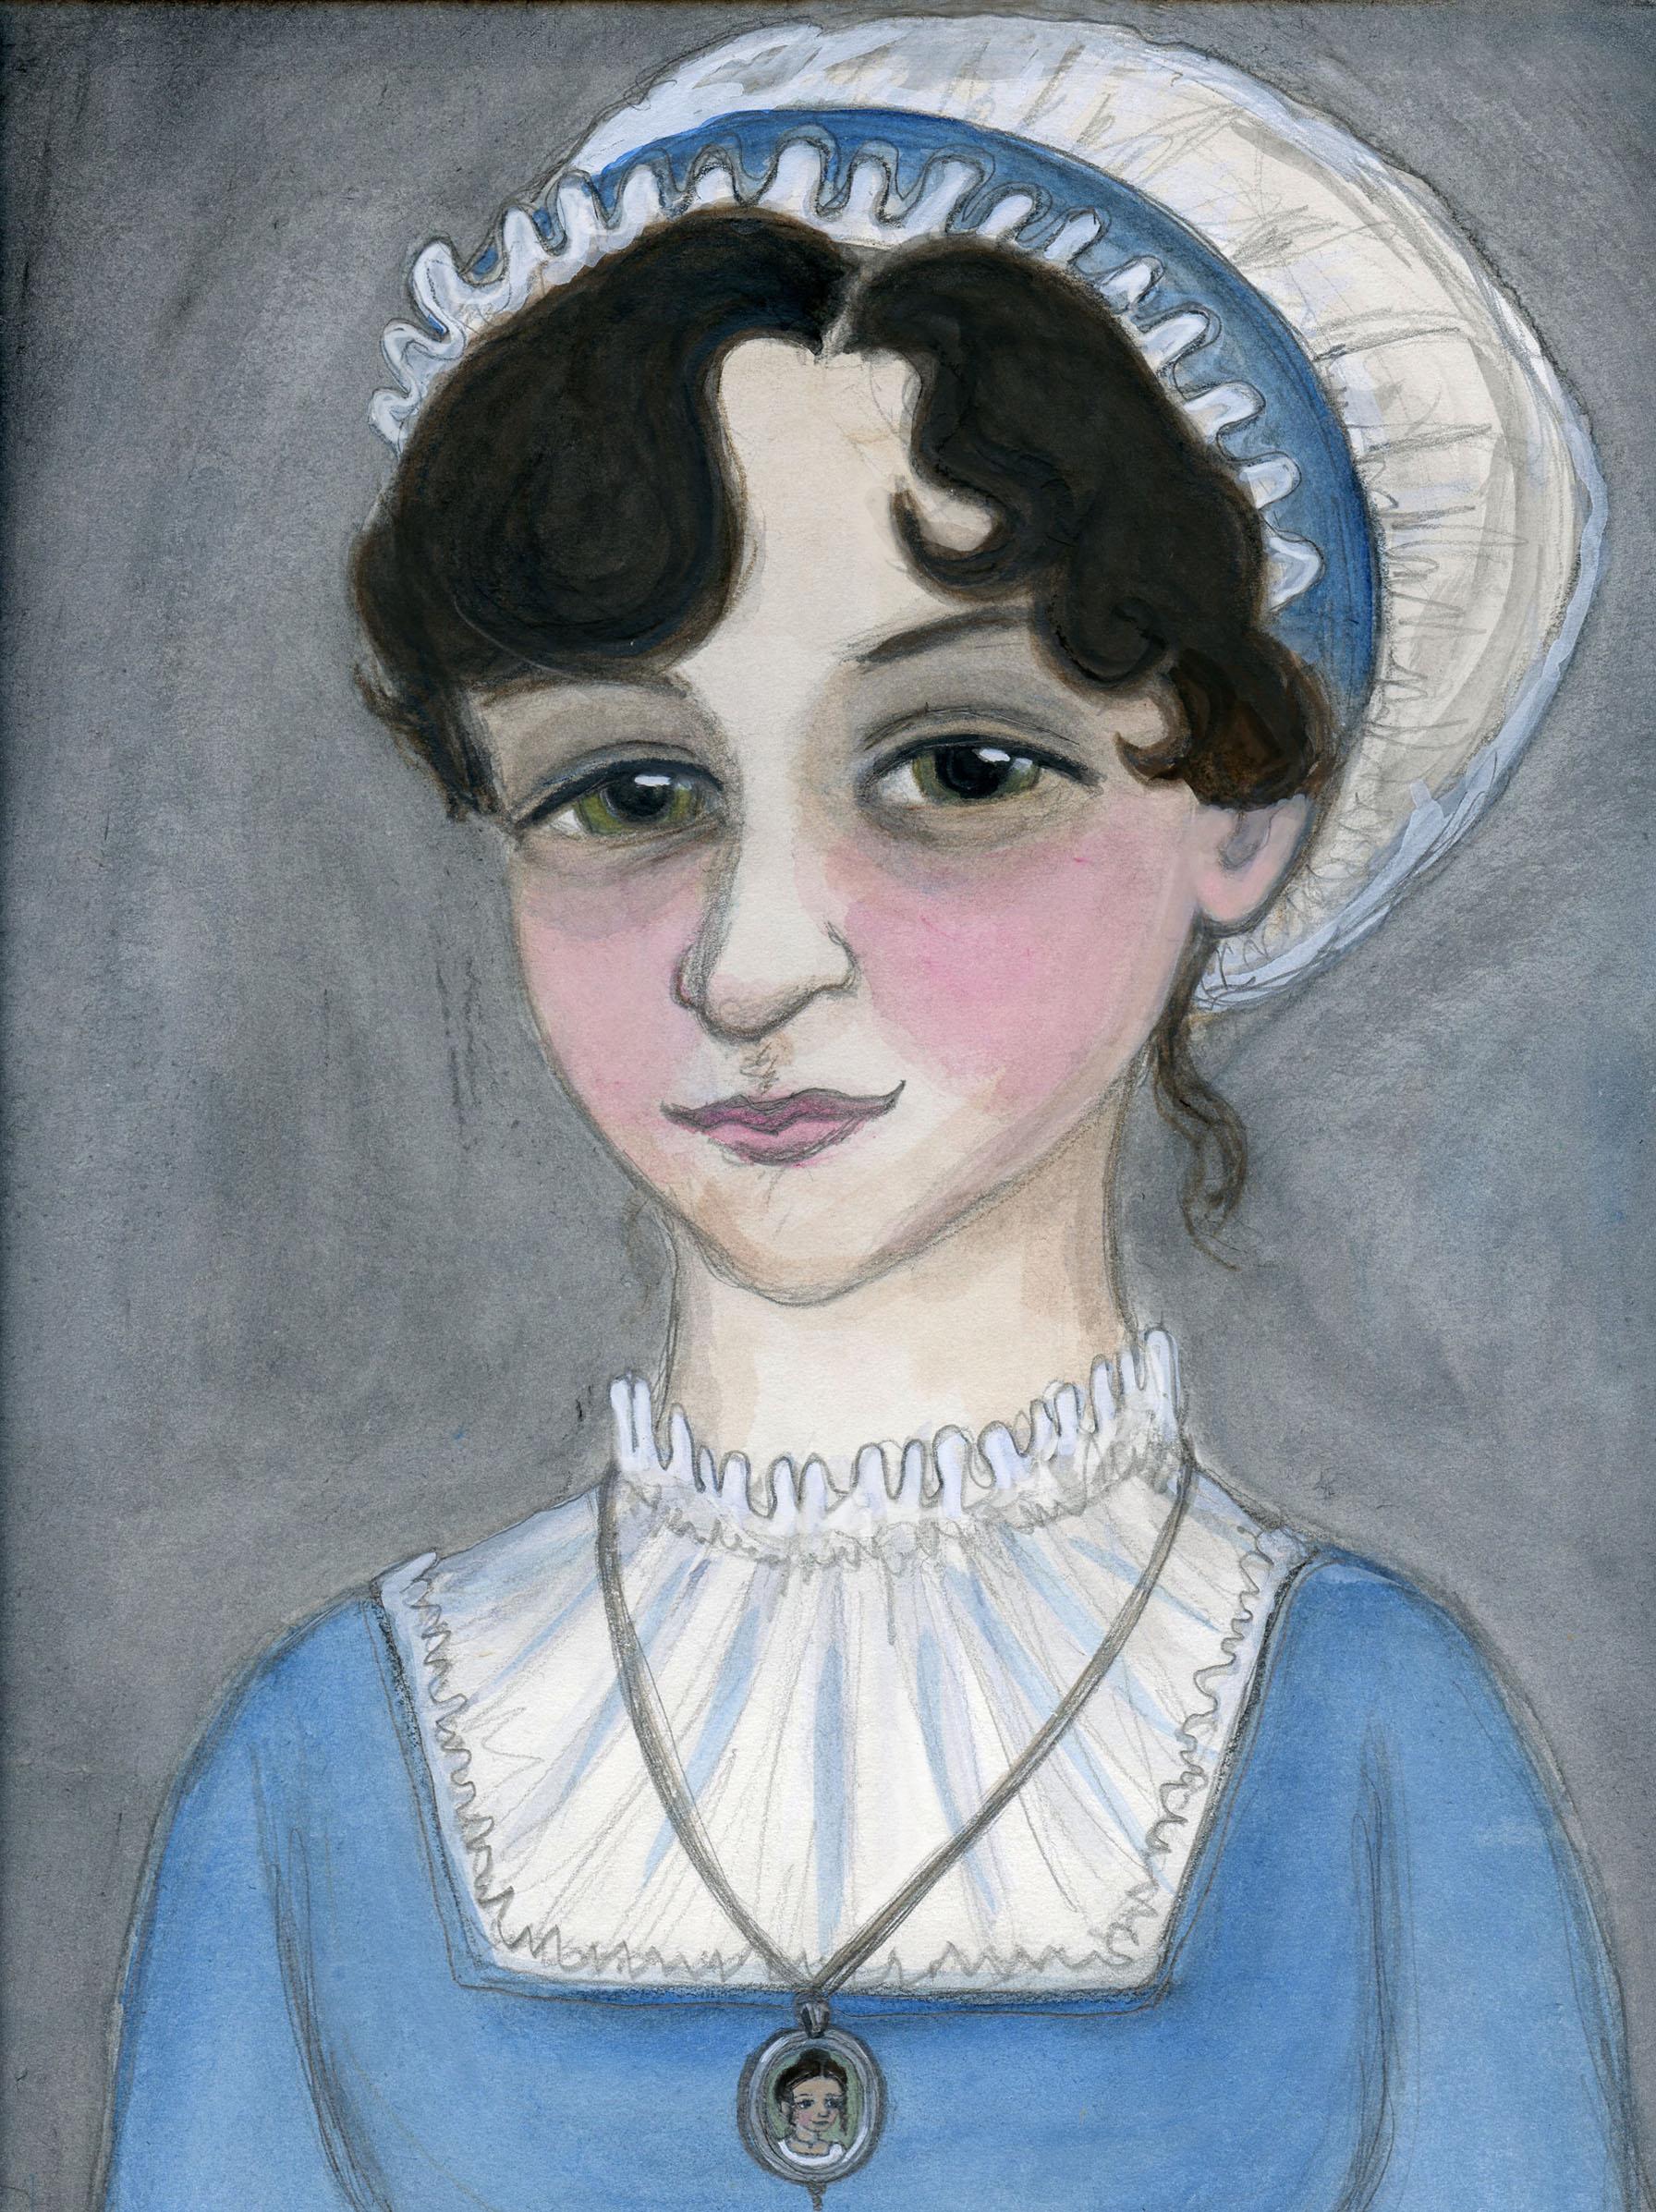 Jane Austen and Her Lost Heart